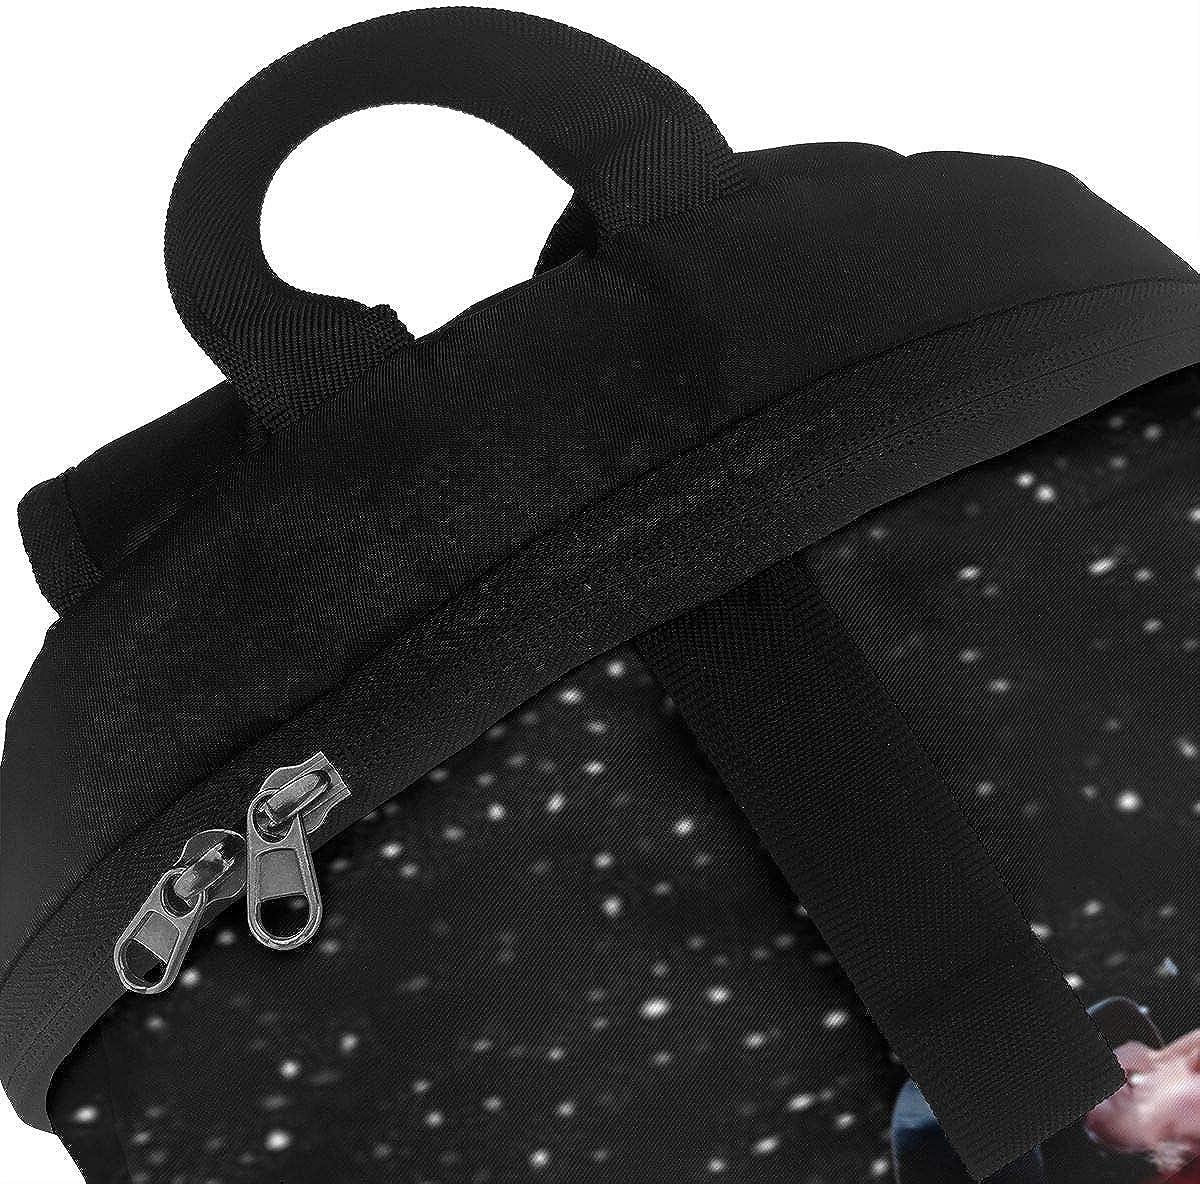 The Greatest Showman Drawstring Bag Sports Fitness Bag Sac de Voyage Sac Cadeau NPNP P.T Barnum Quote